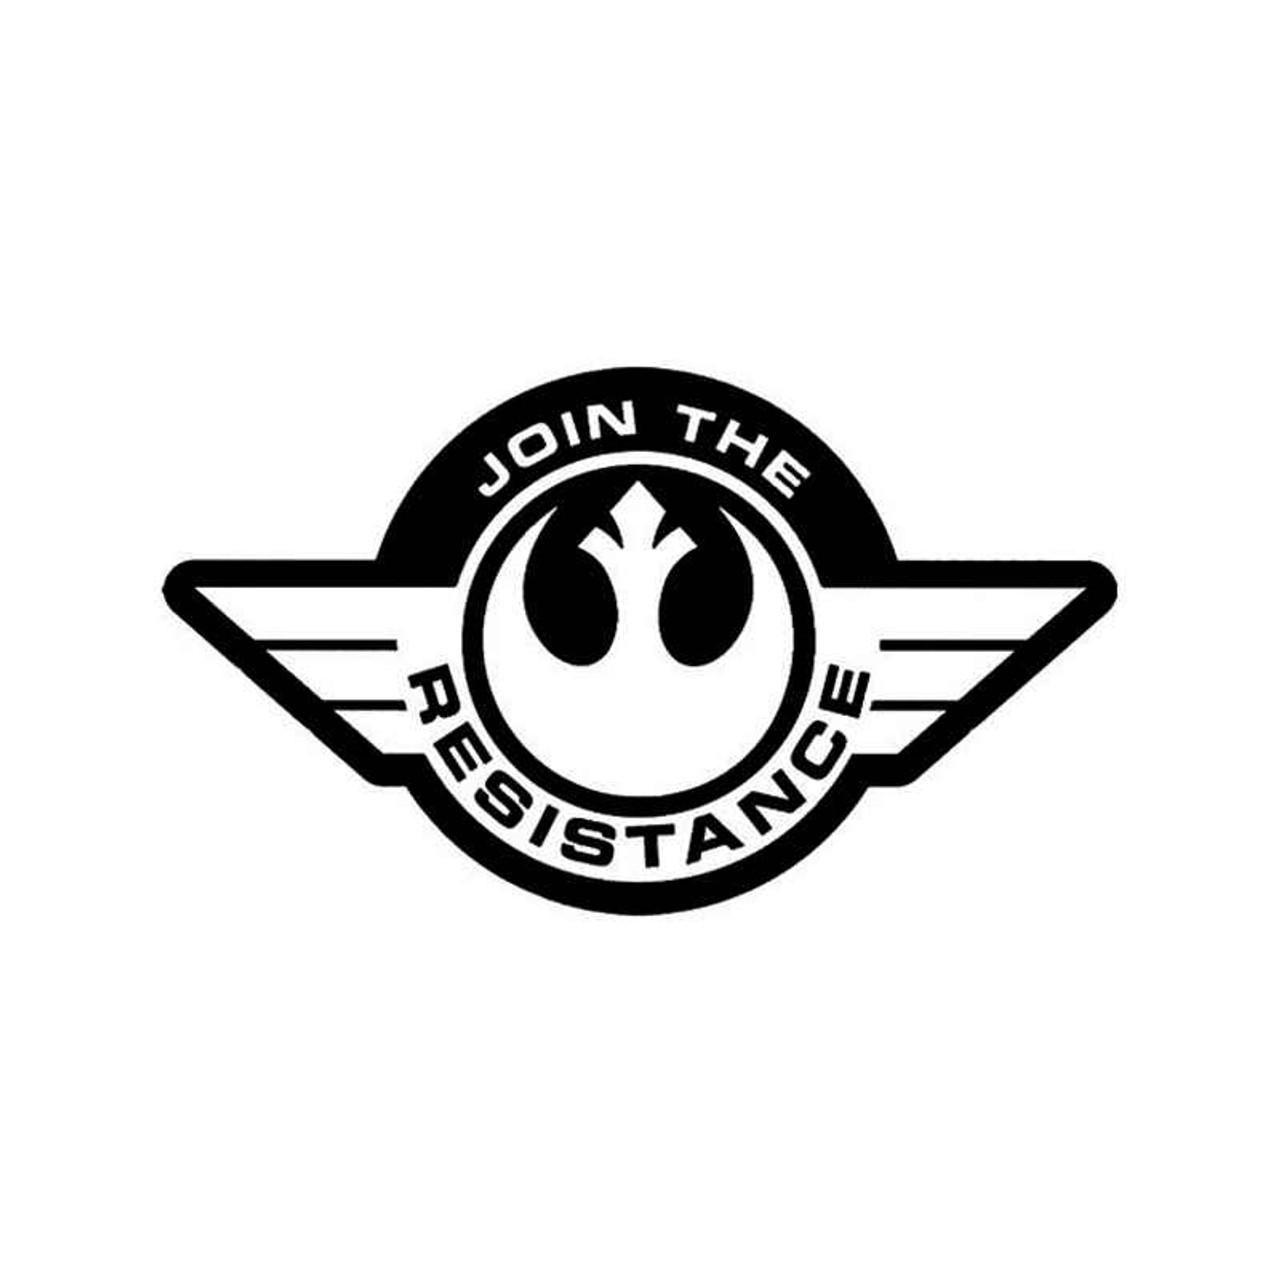 Star Wars Resistance Symbol Logo For Vinyl Sticker